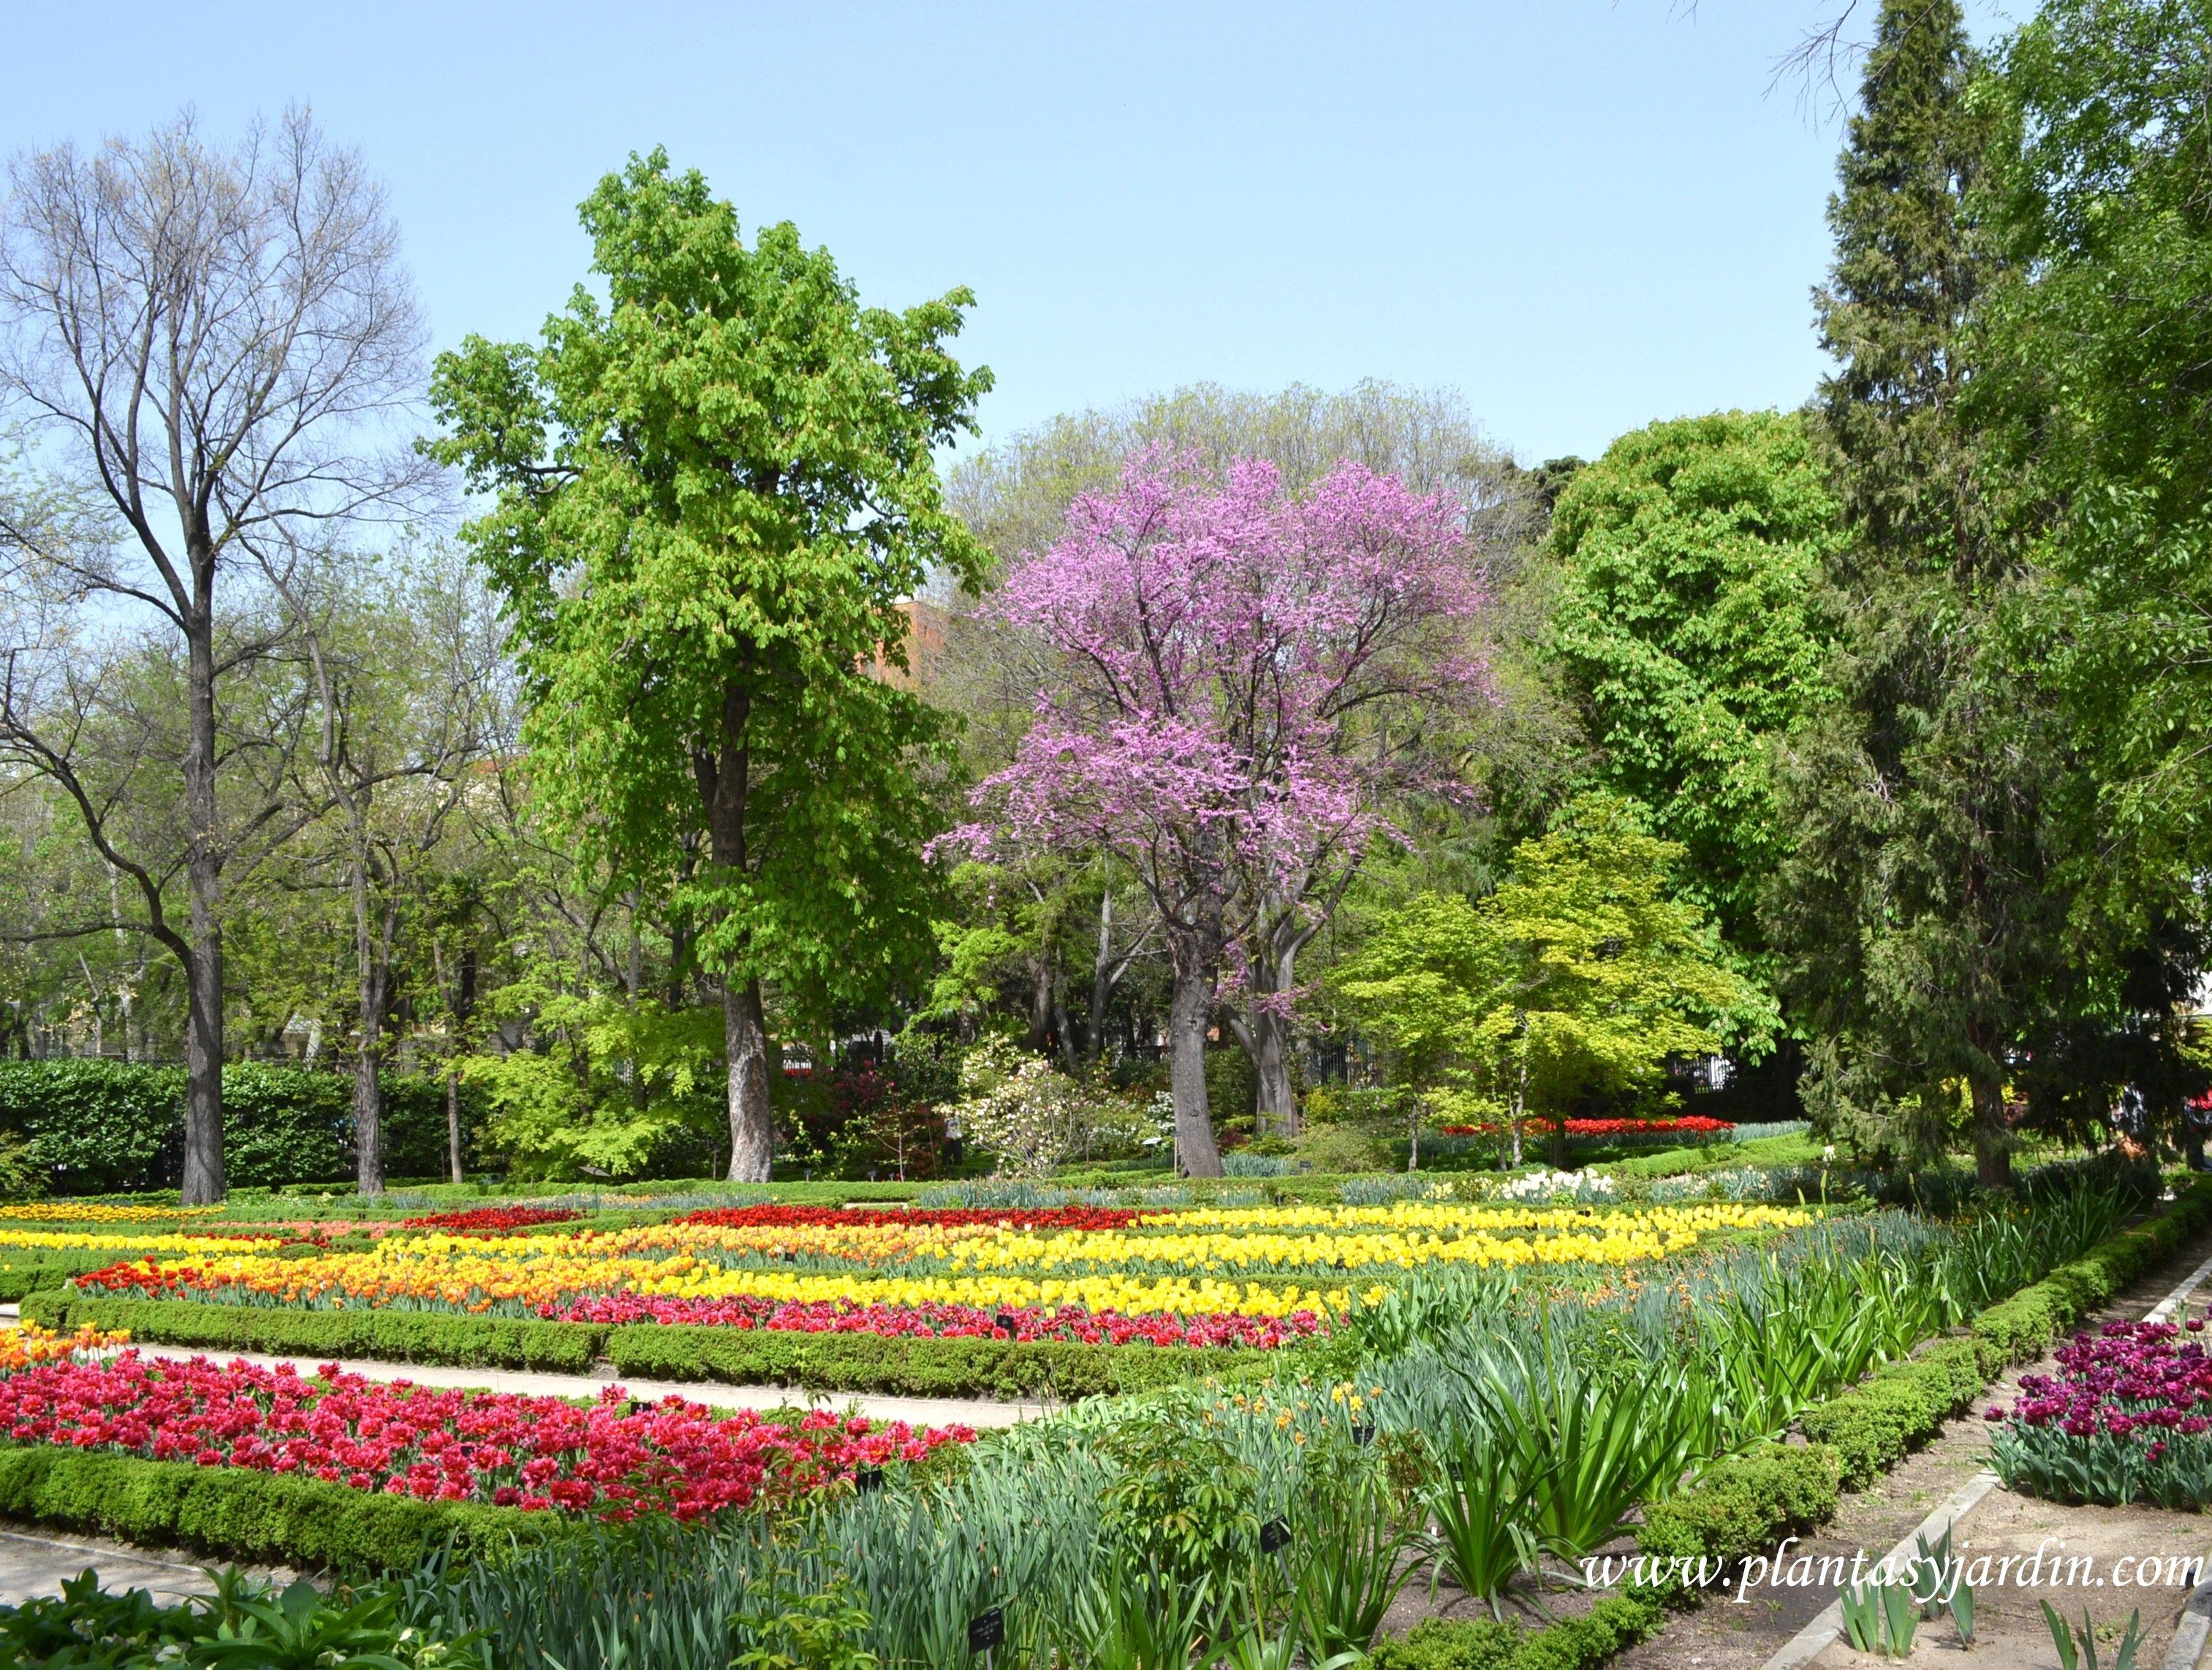 Cercis siliquastrum florecido en primavera & parterres de Tulipanes.